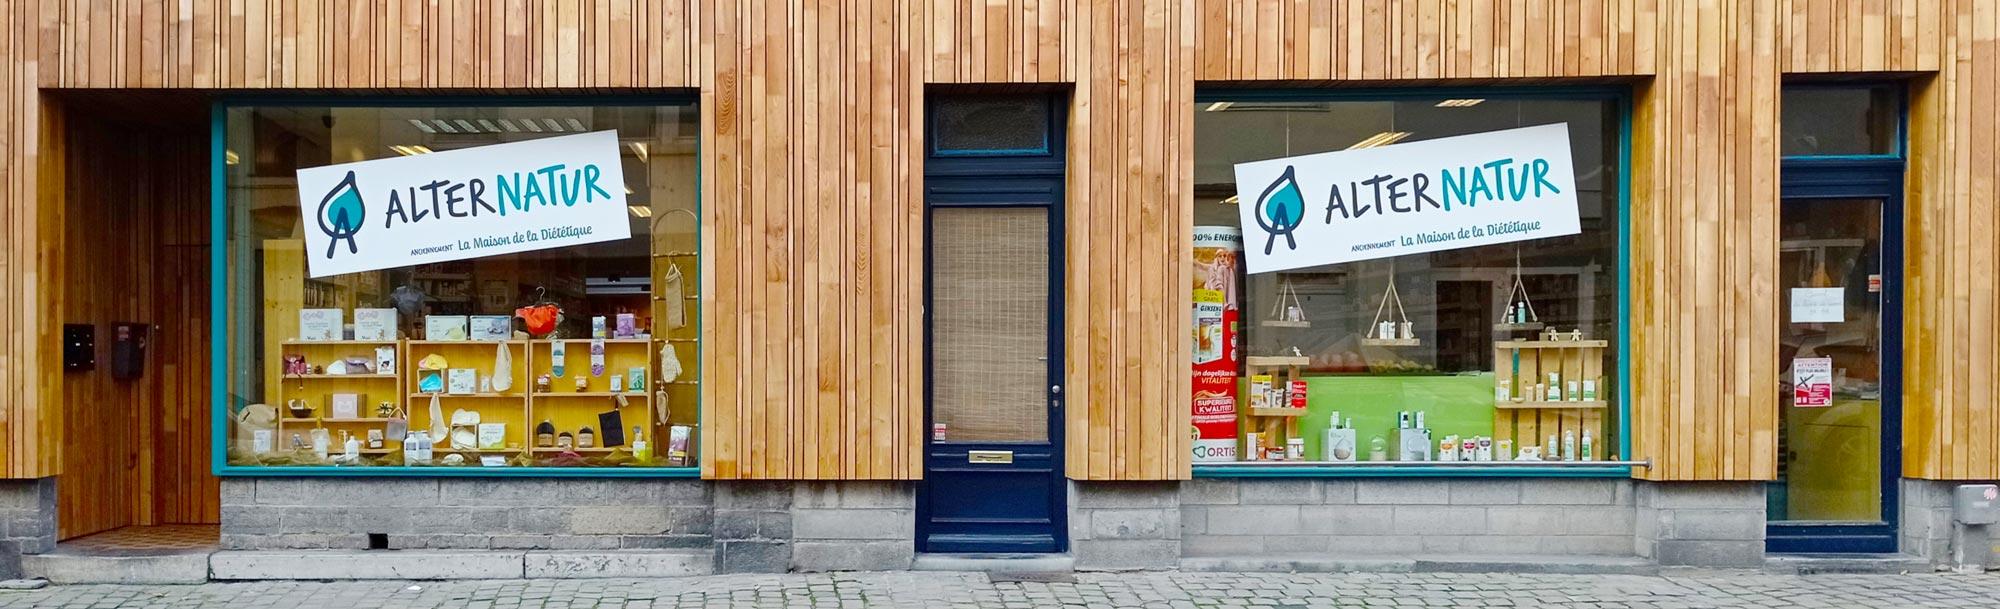 Alternatur | Rue du Quesnoy, 18 - 7500 Tournai